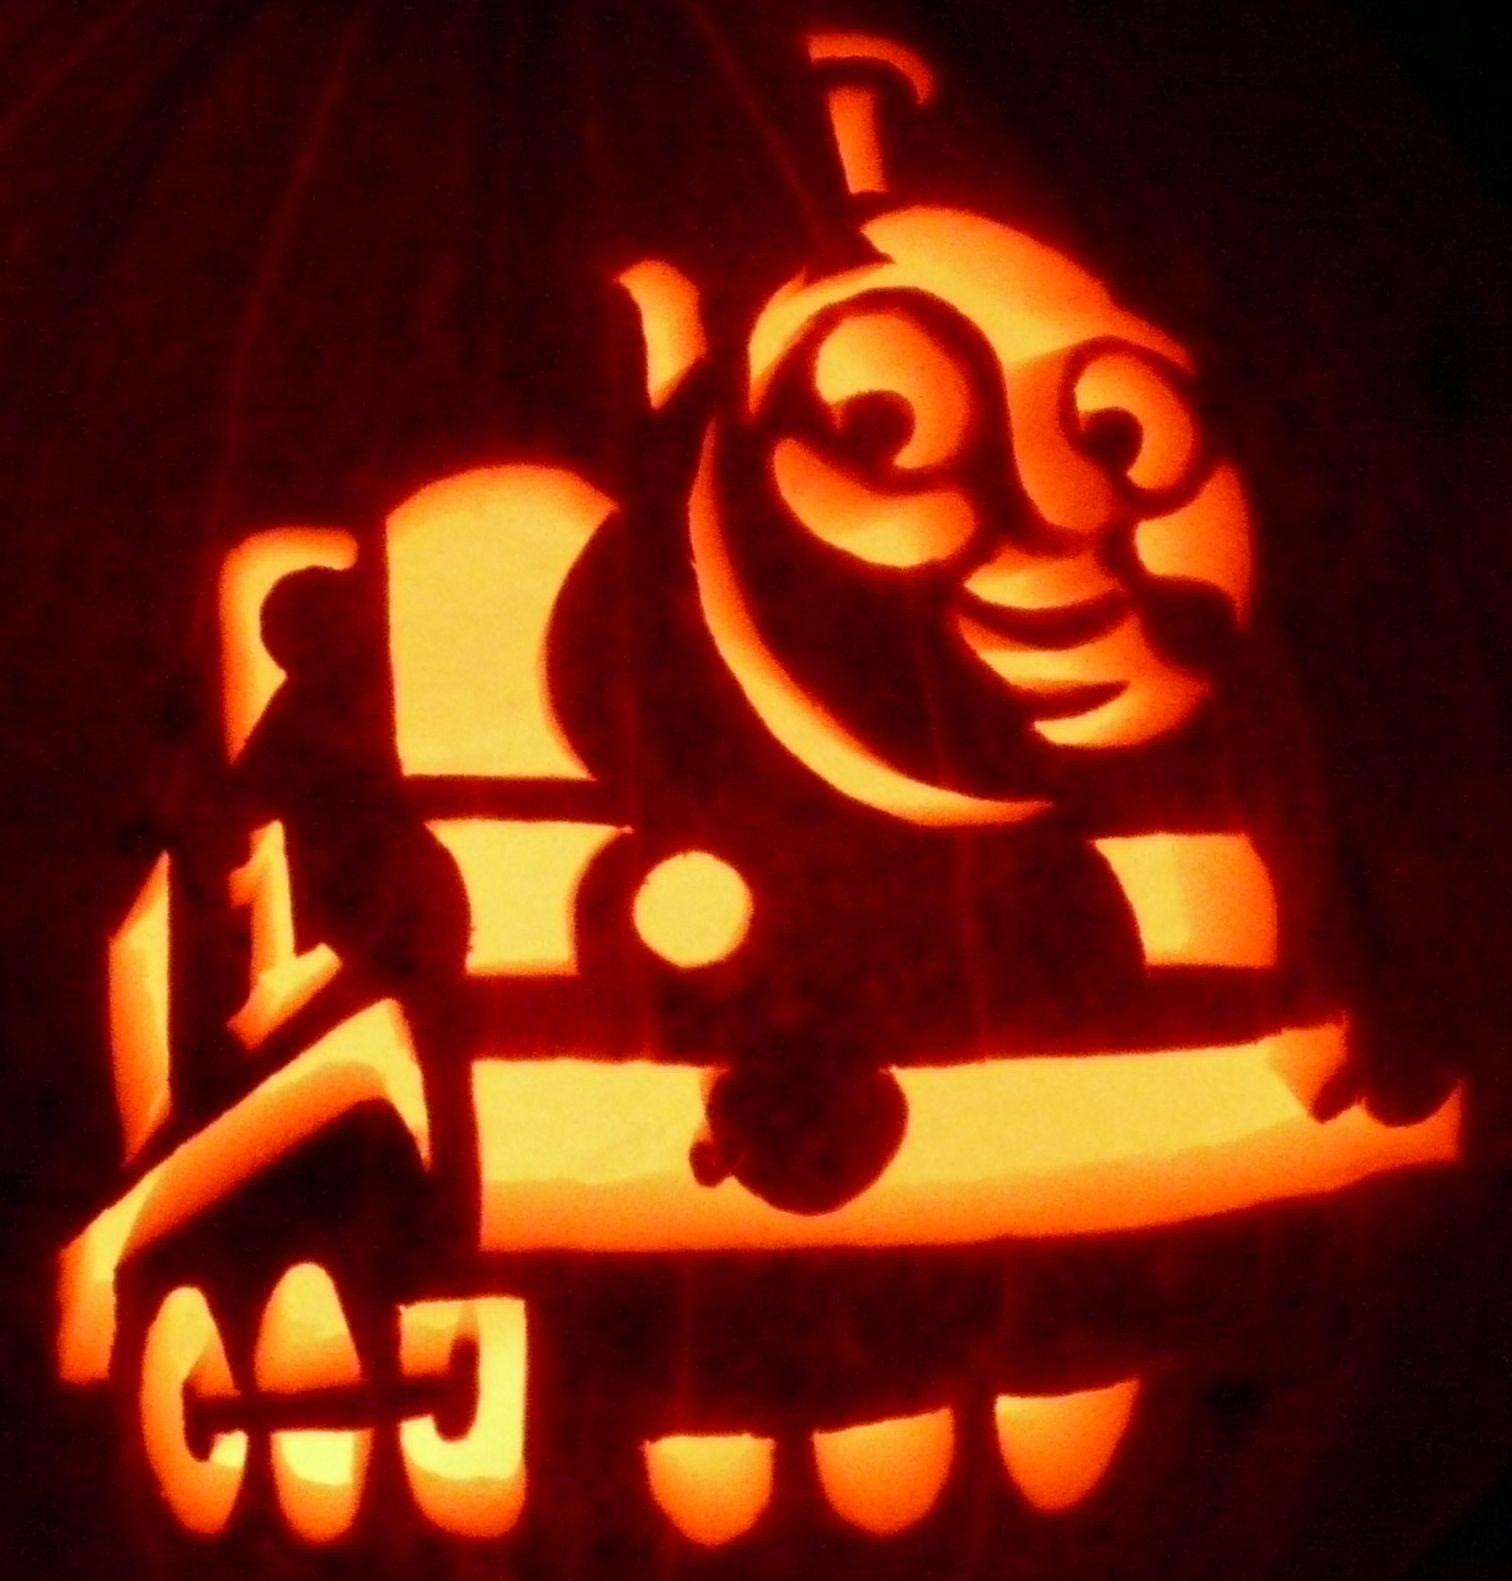 Here S Zombiepumpkins Com S Thomas The Train On A Real Pumpkin Pumpkin Carving Amazing Pumpkin Carving Pumpkin Carving Patterns